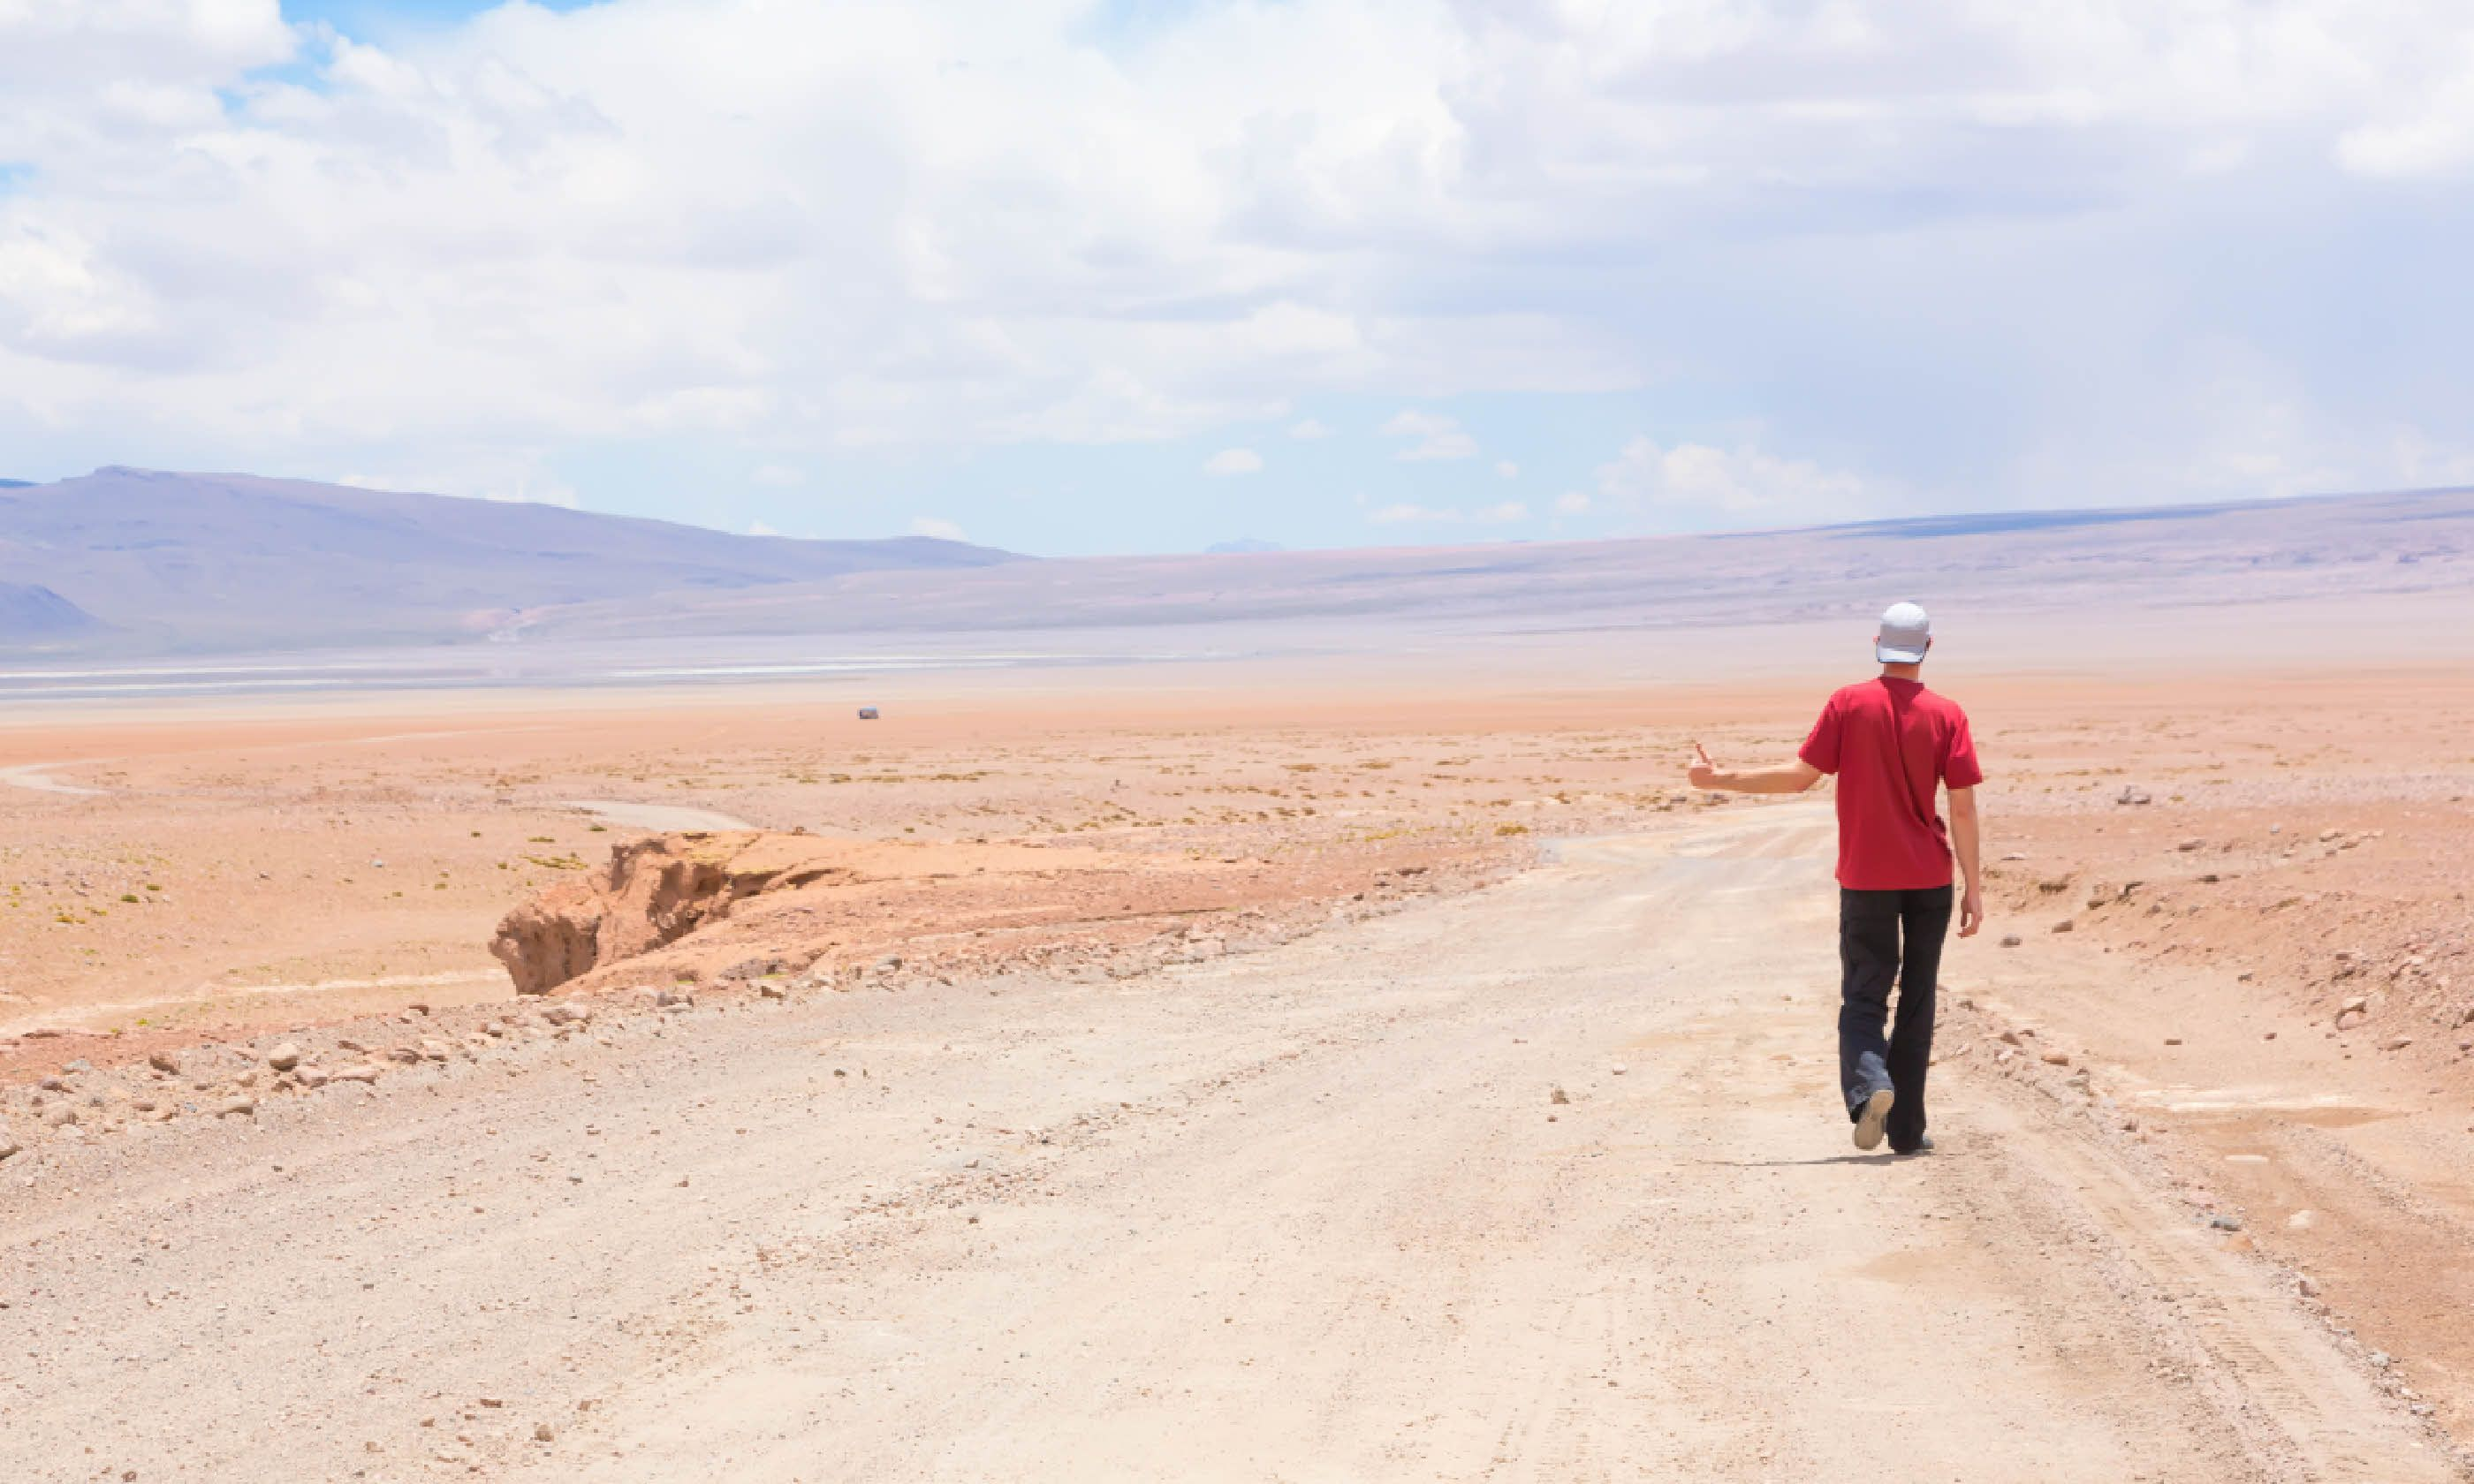 Hitchhiking in Bolivia (Dreamstime)